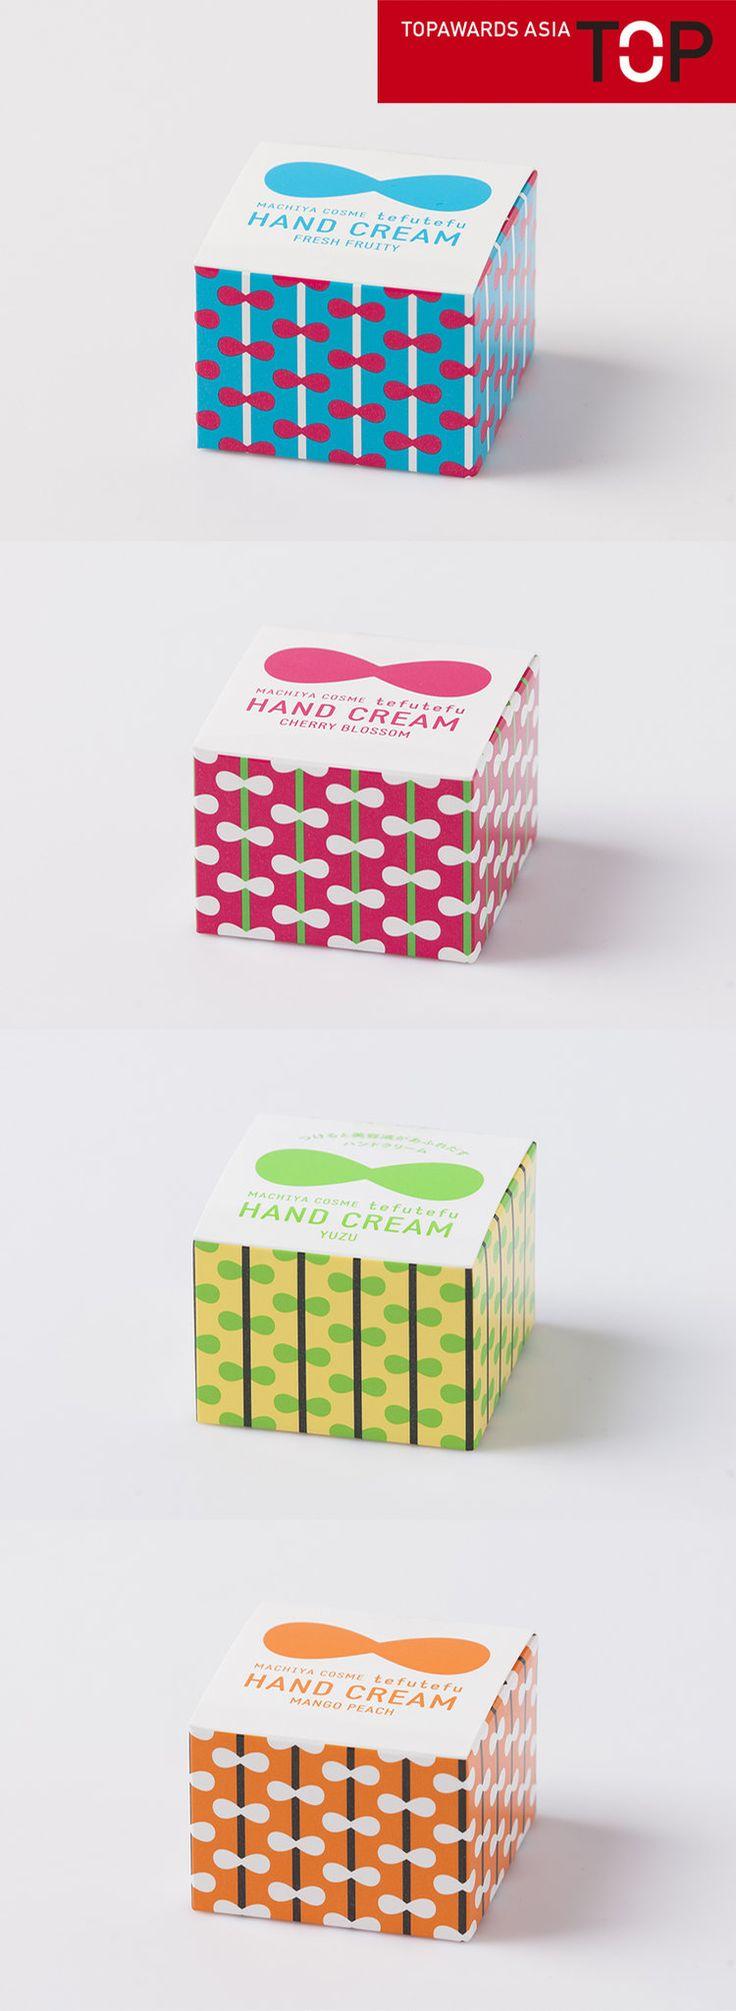 tefutefu Hand Cream — Topawards Asia